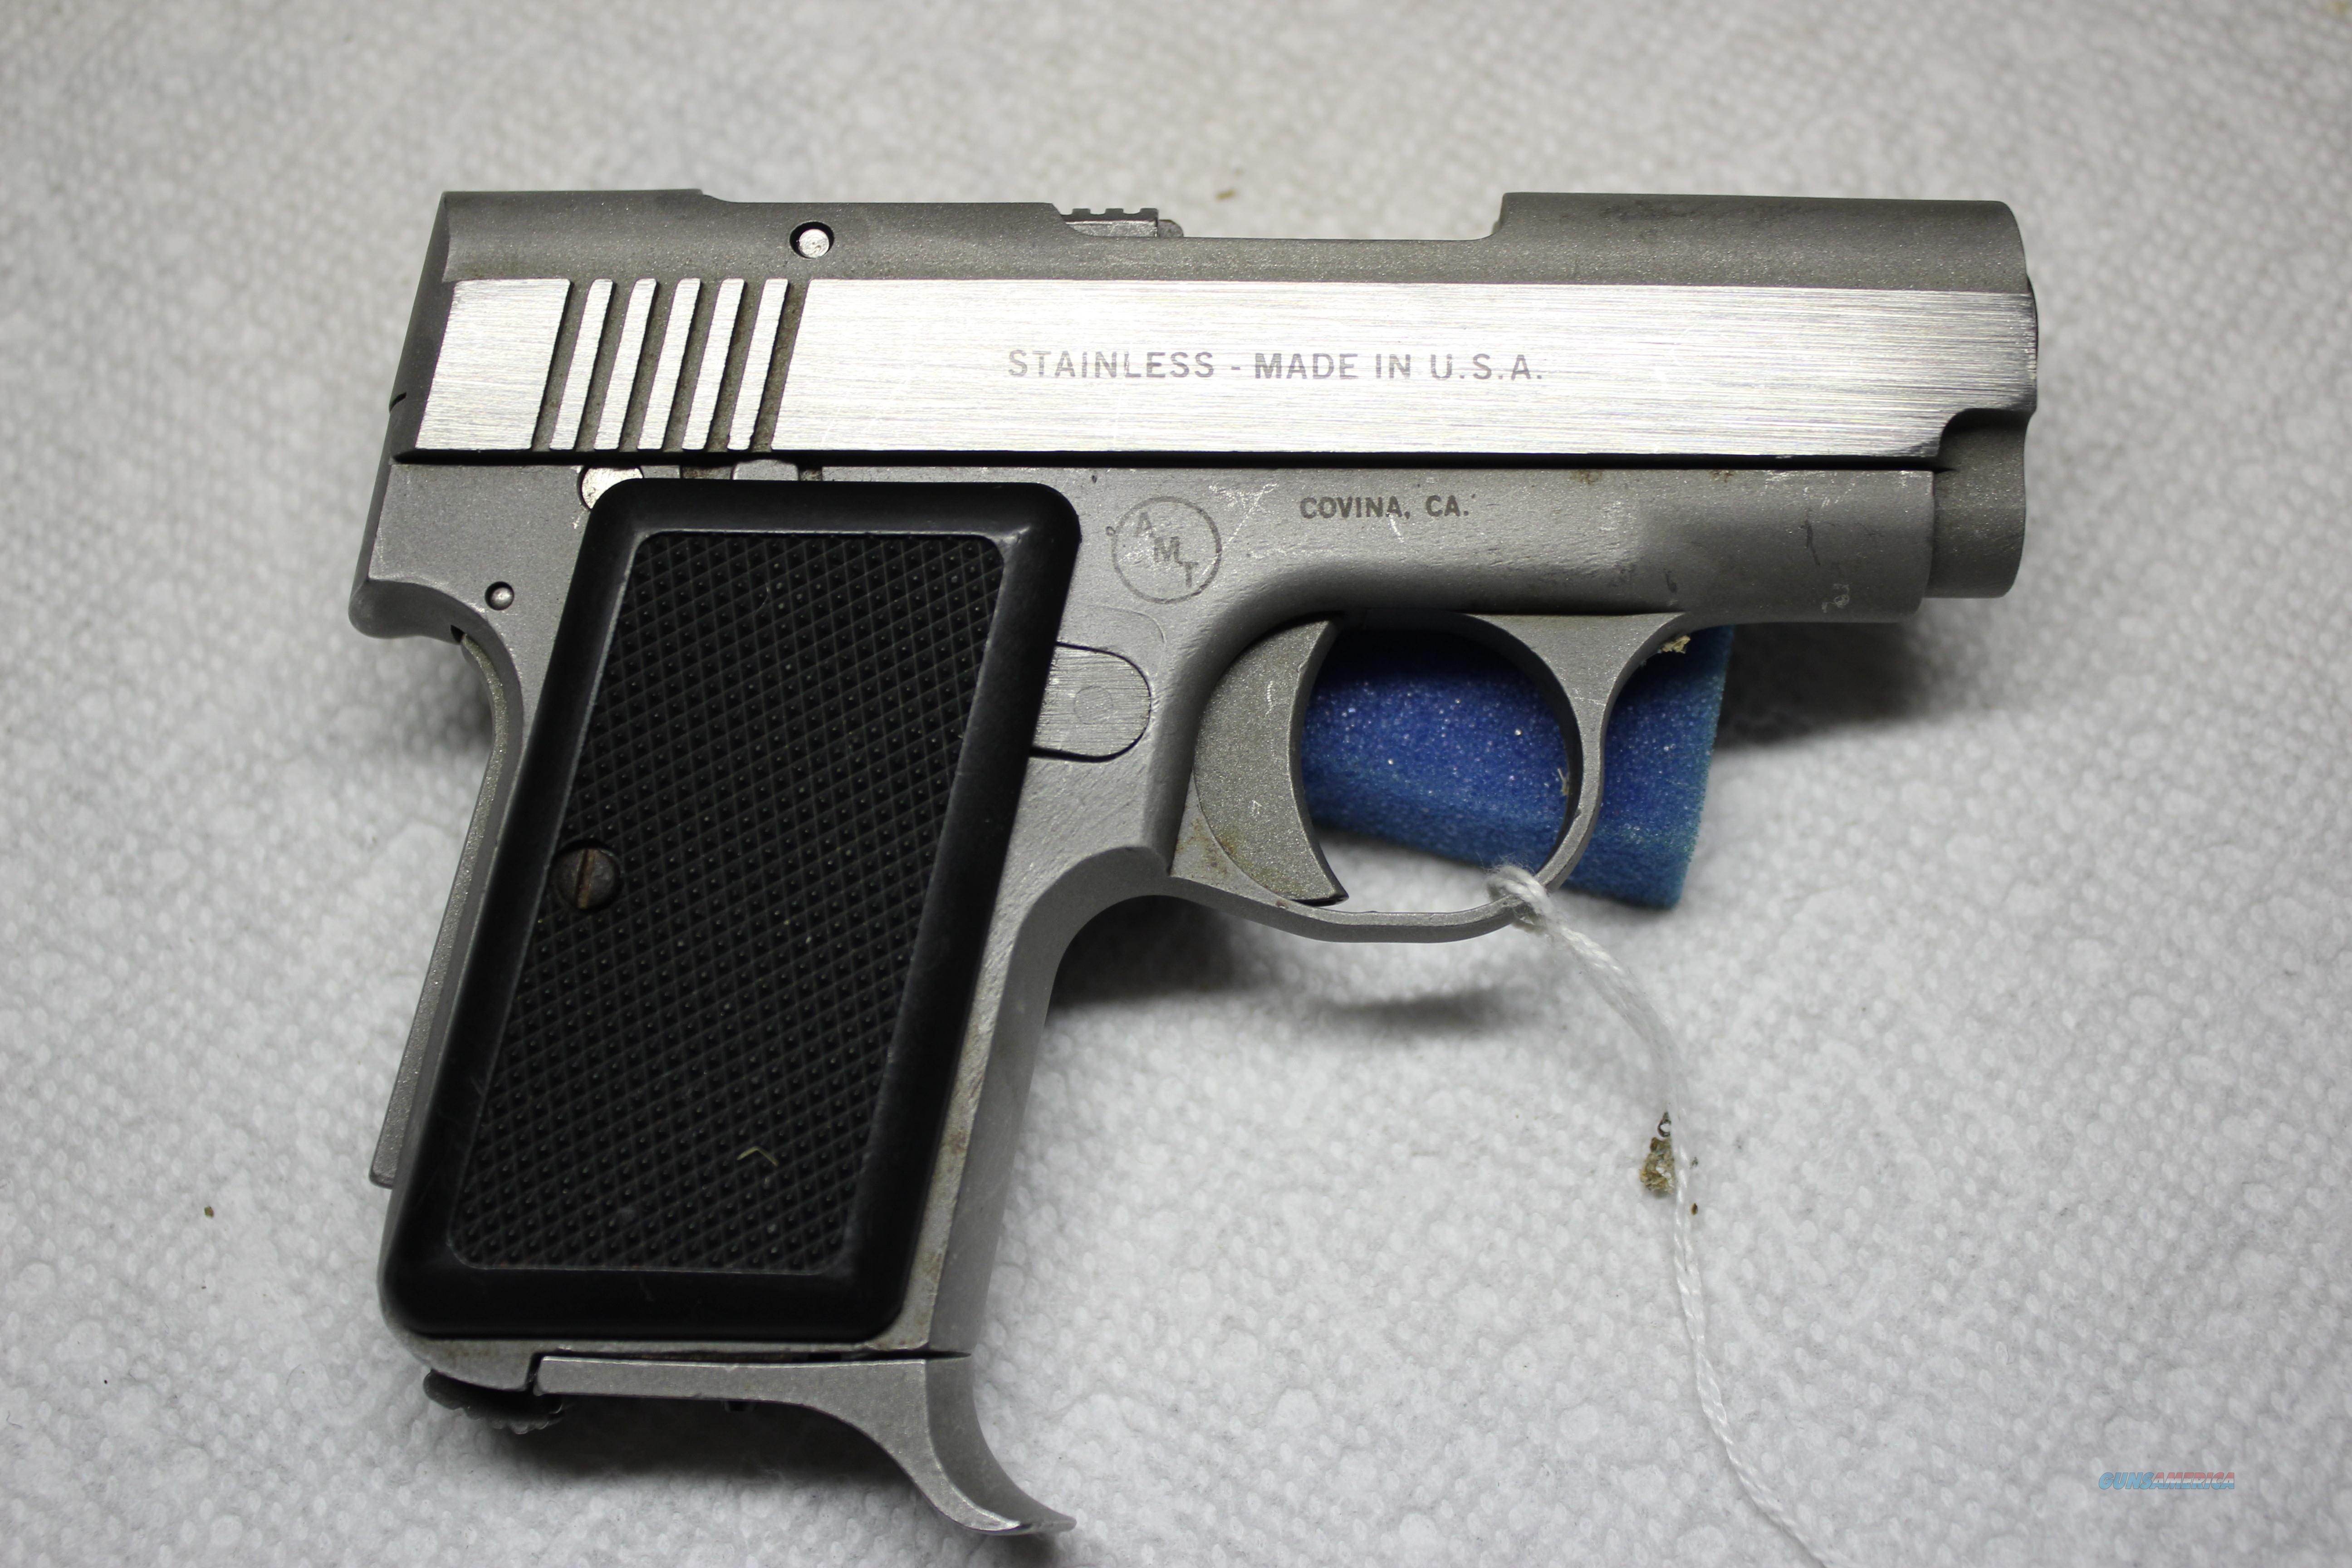 AMT BACK-UP 380  Guns > Pistols > AMT Pistols > Other